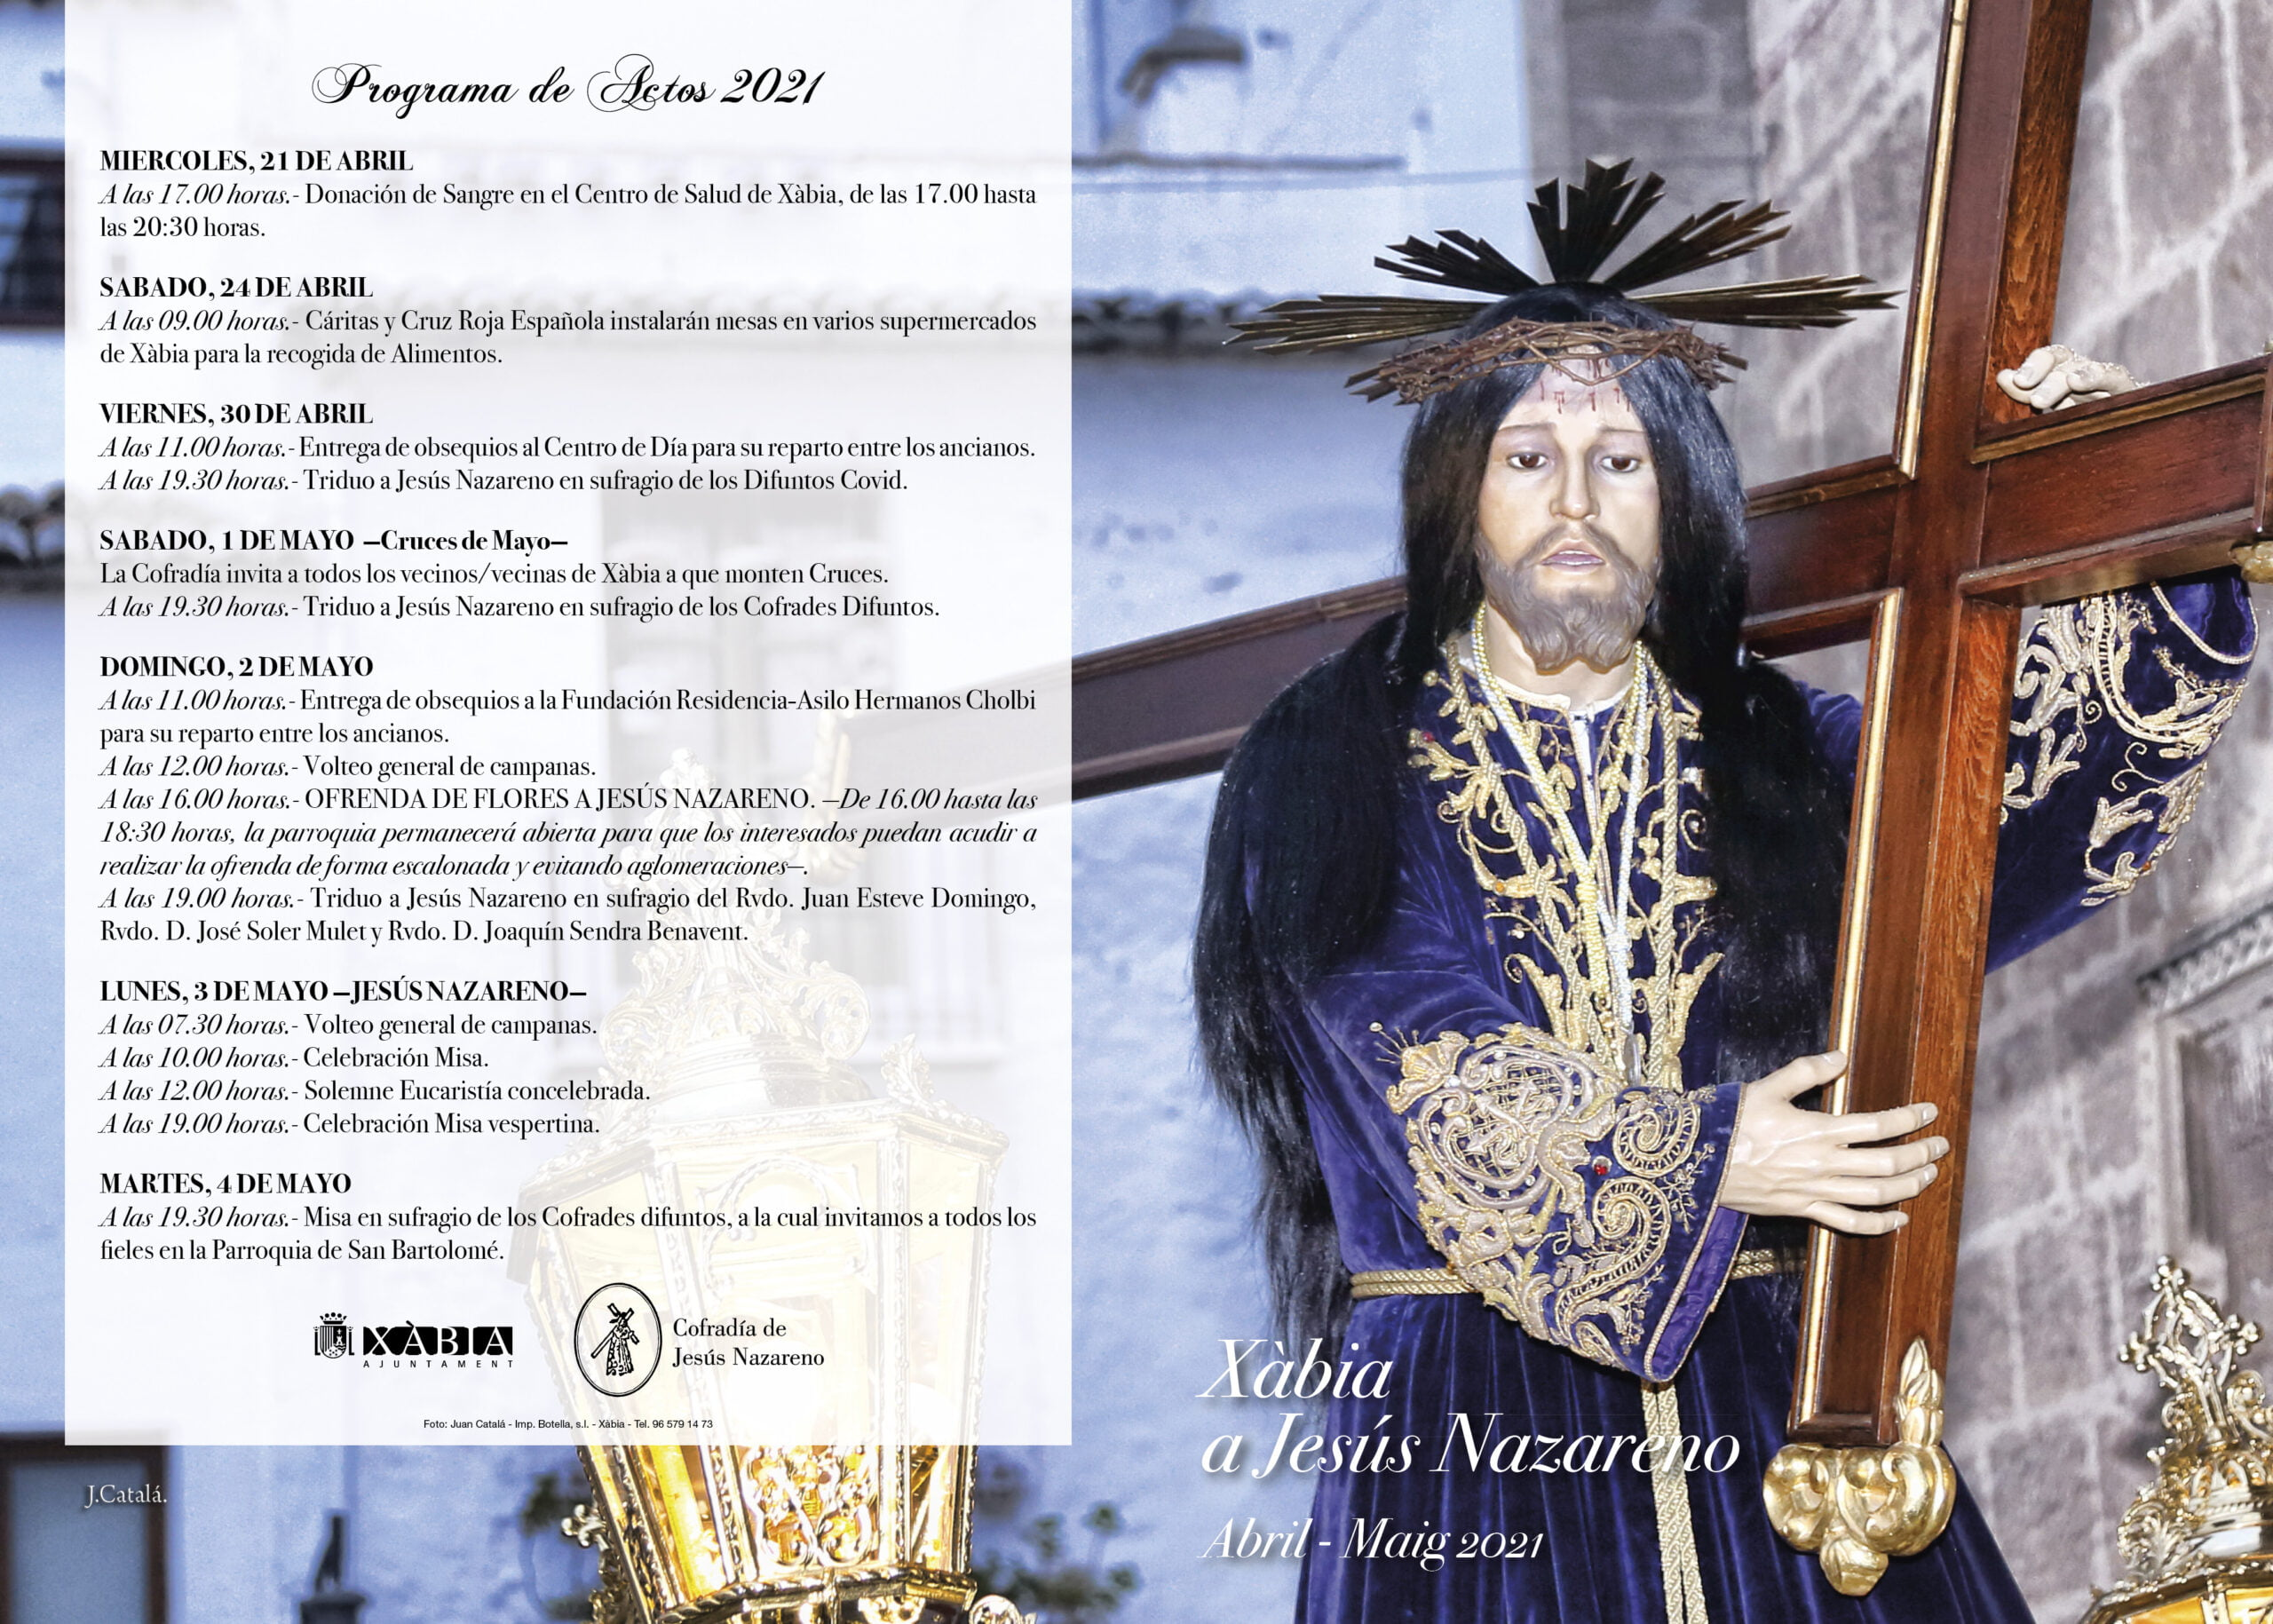 Programación de actos en honor a Jesús Nazareno